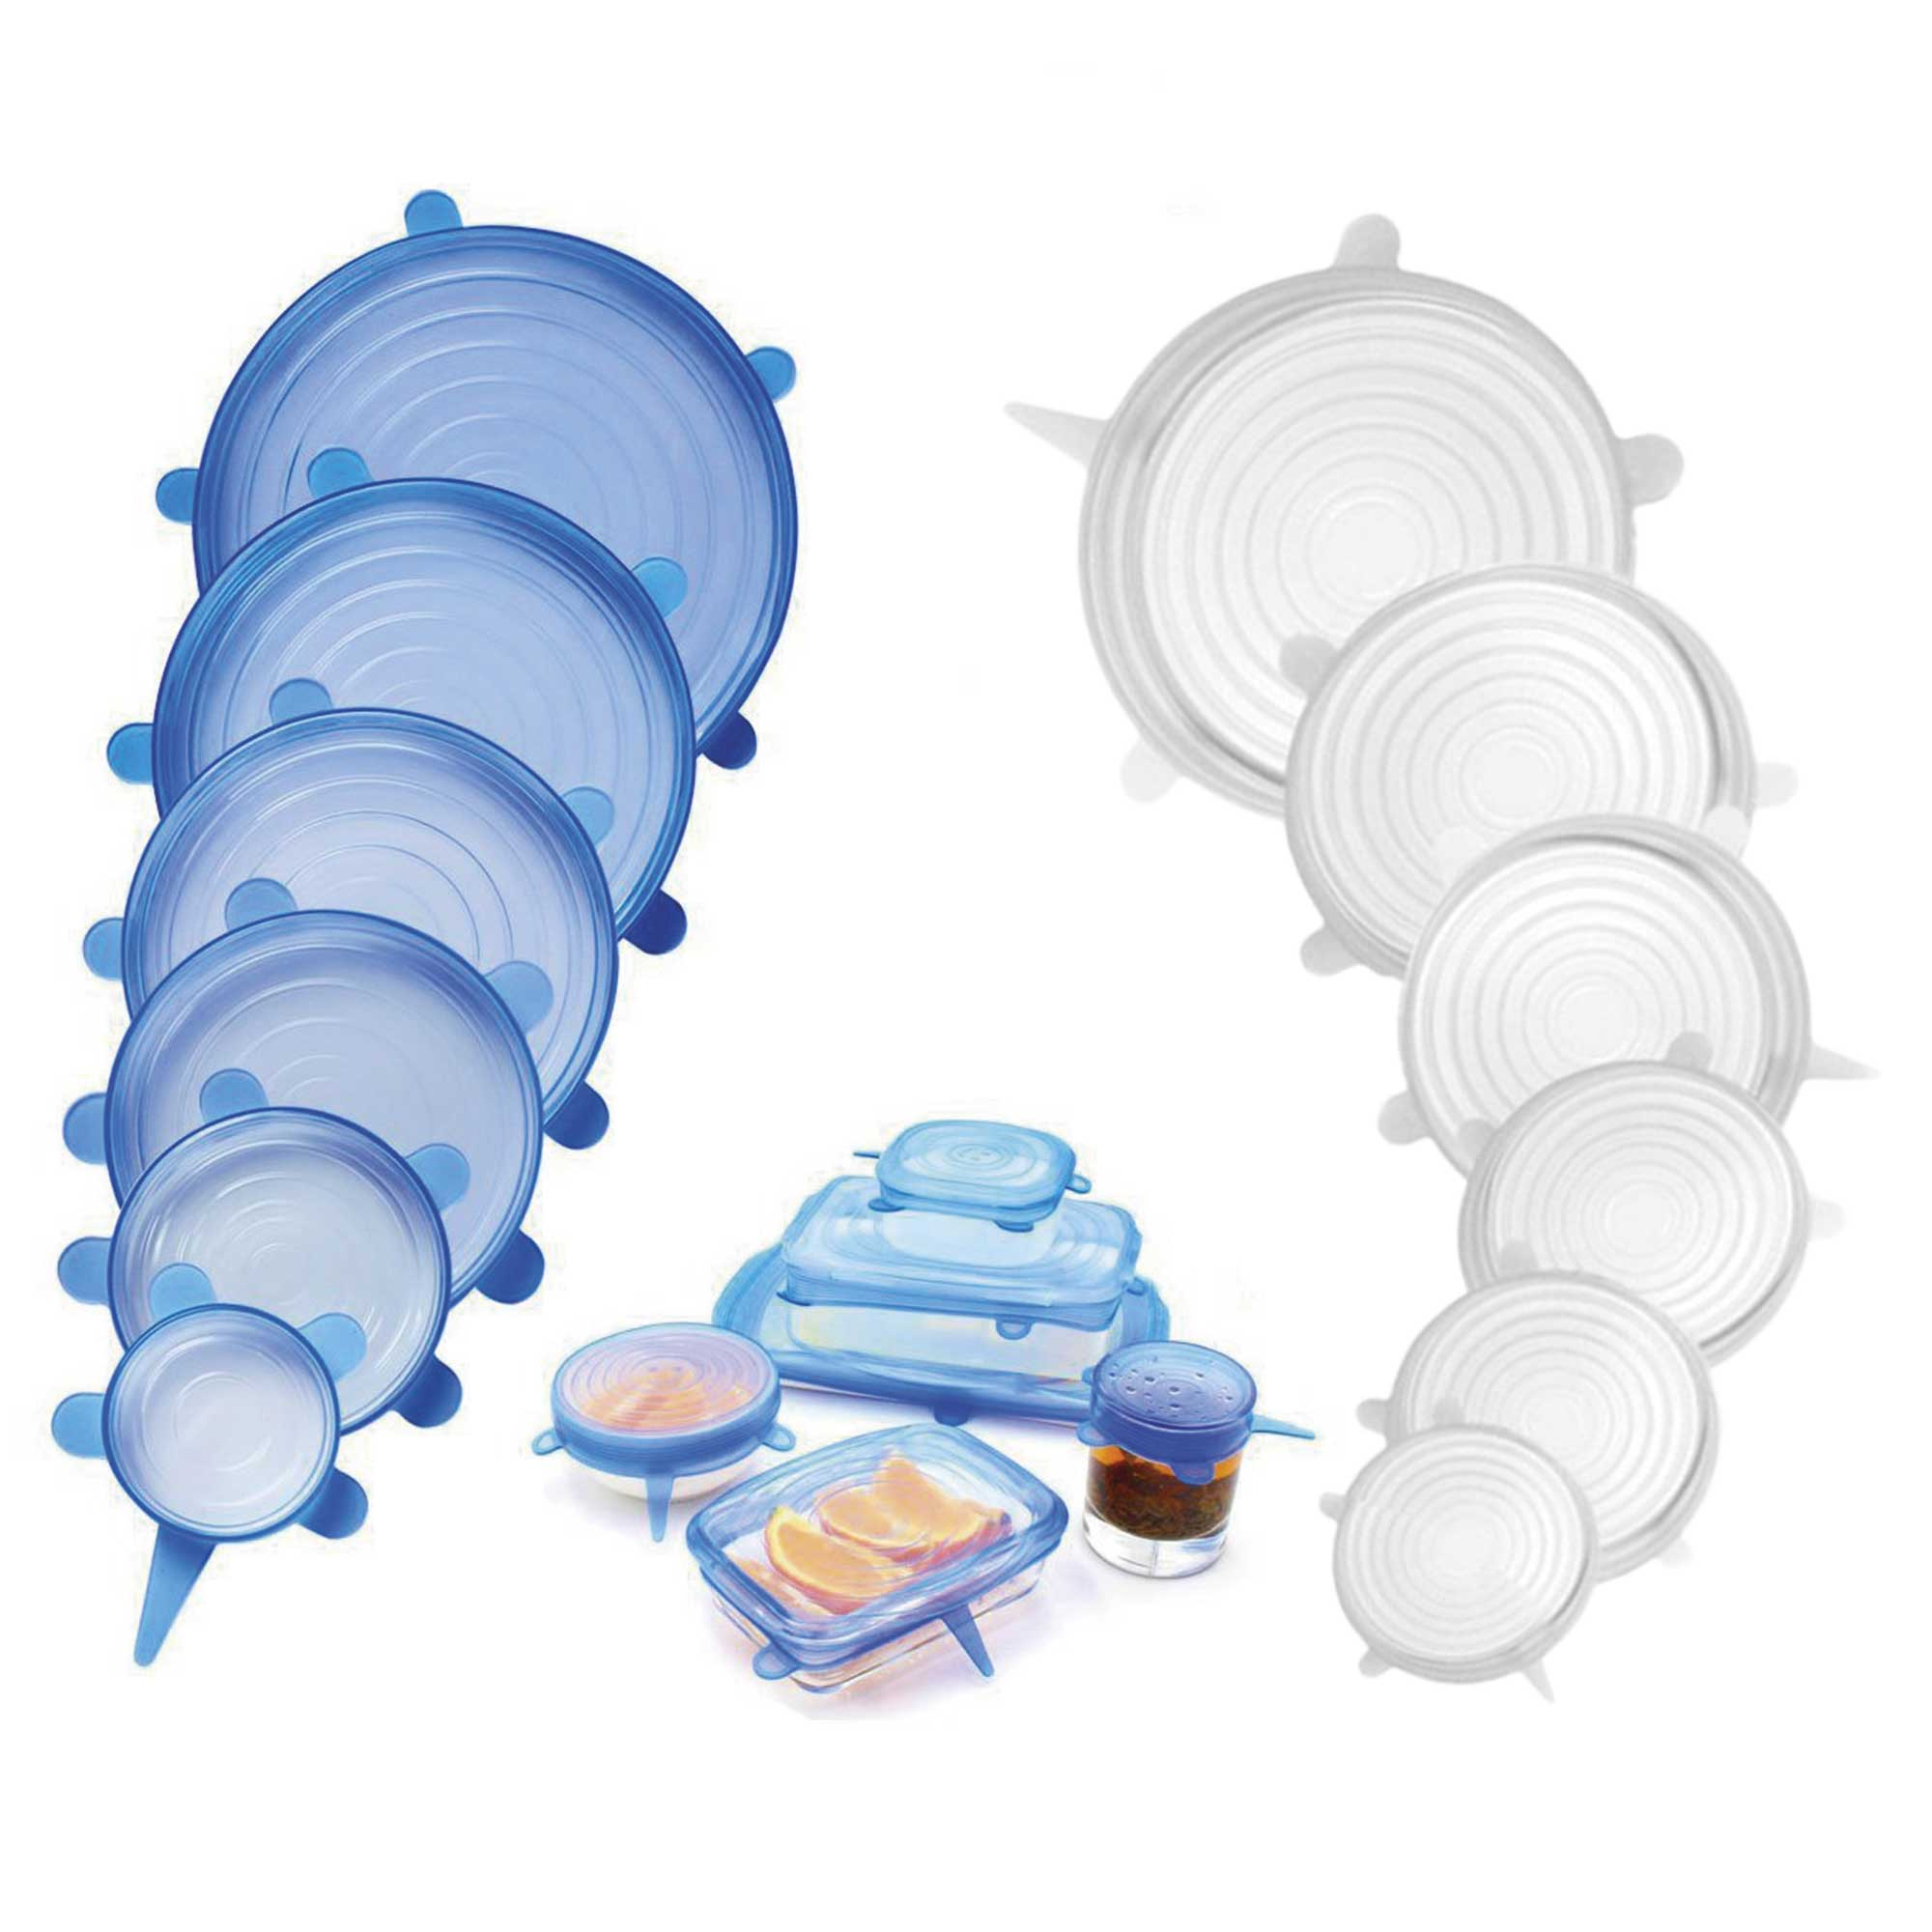 Kit de 12 Tampas de Silicone Universal  Azul e Branco (2 kits x 6)